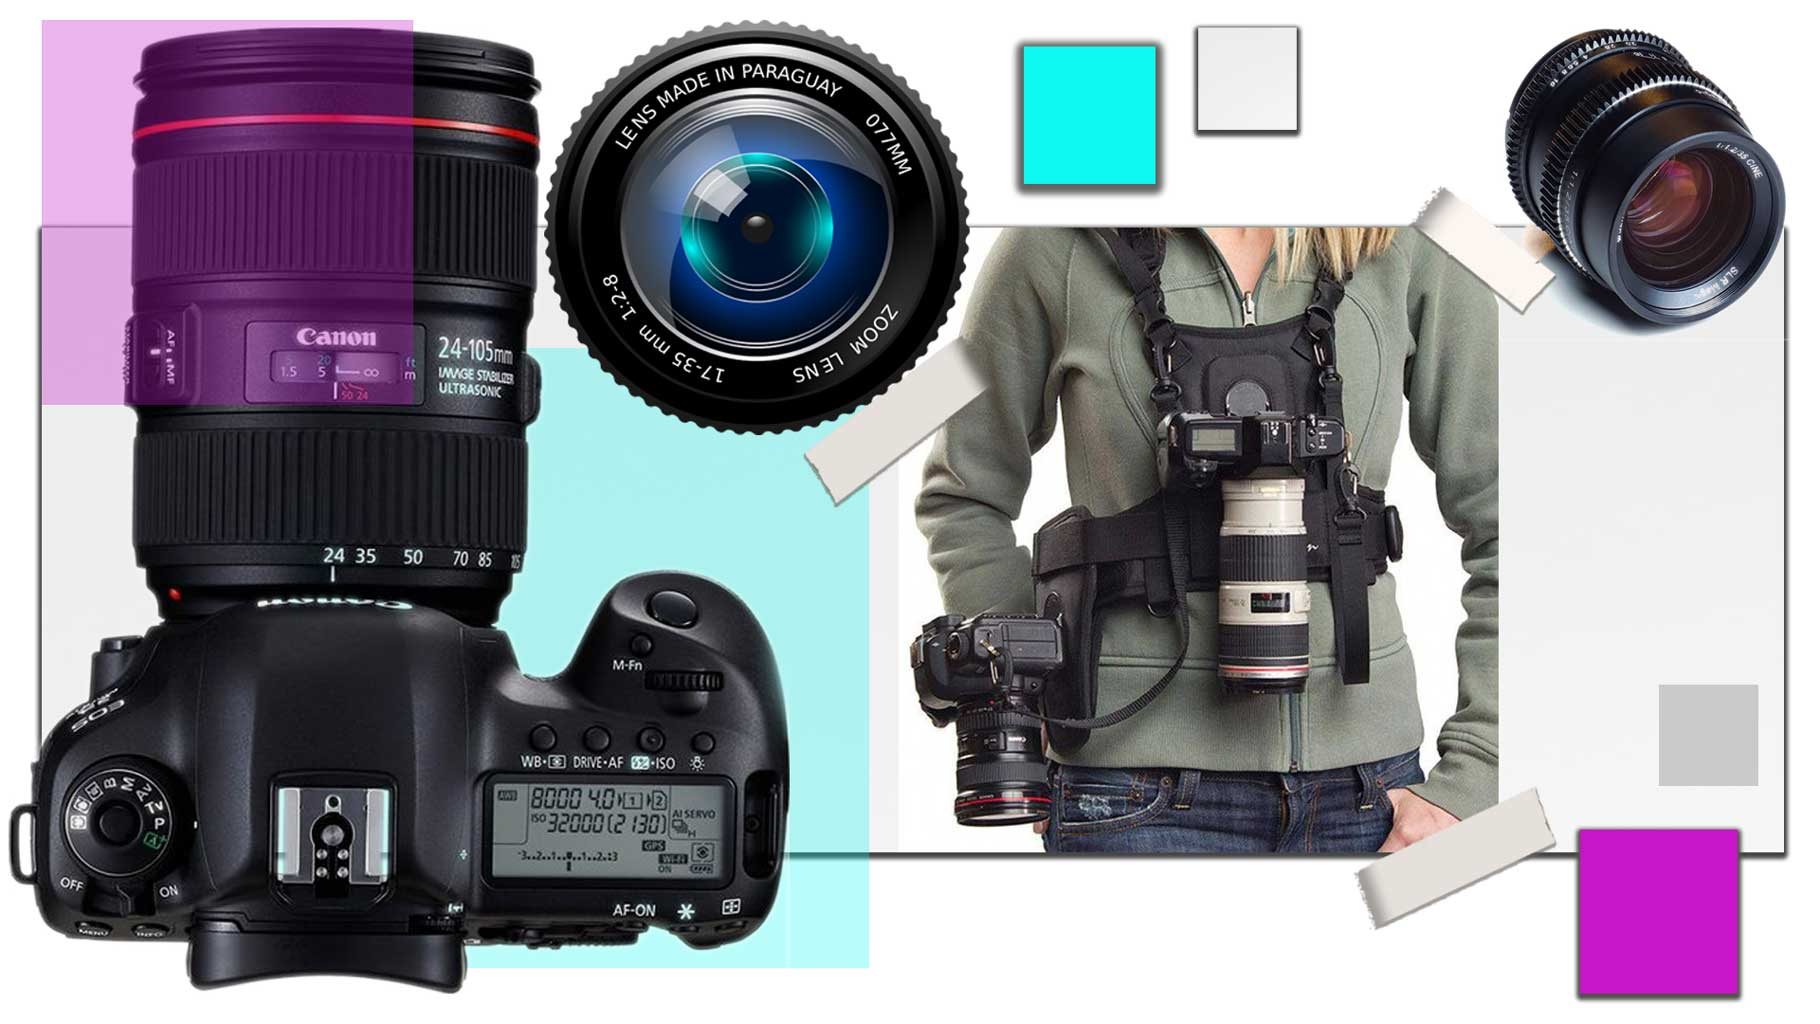 professiona1 photographe 11a - چگونه میتوان حرفه عکاسی را برای همیشه داشت ؟